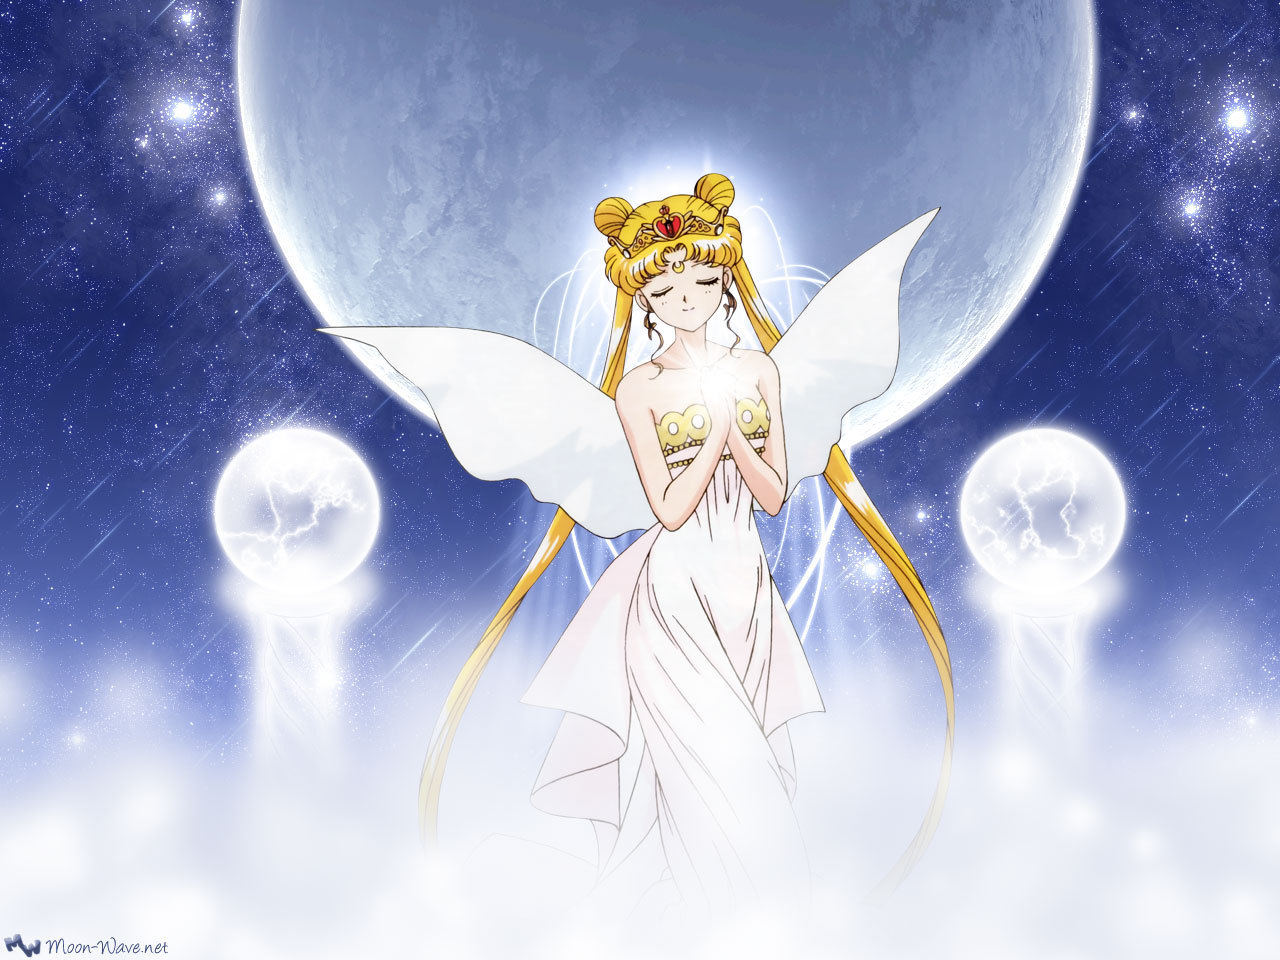 Sailor Moon's